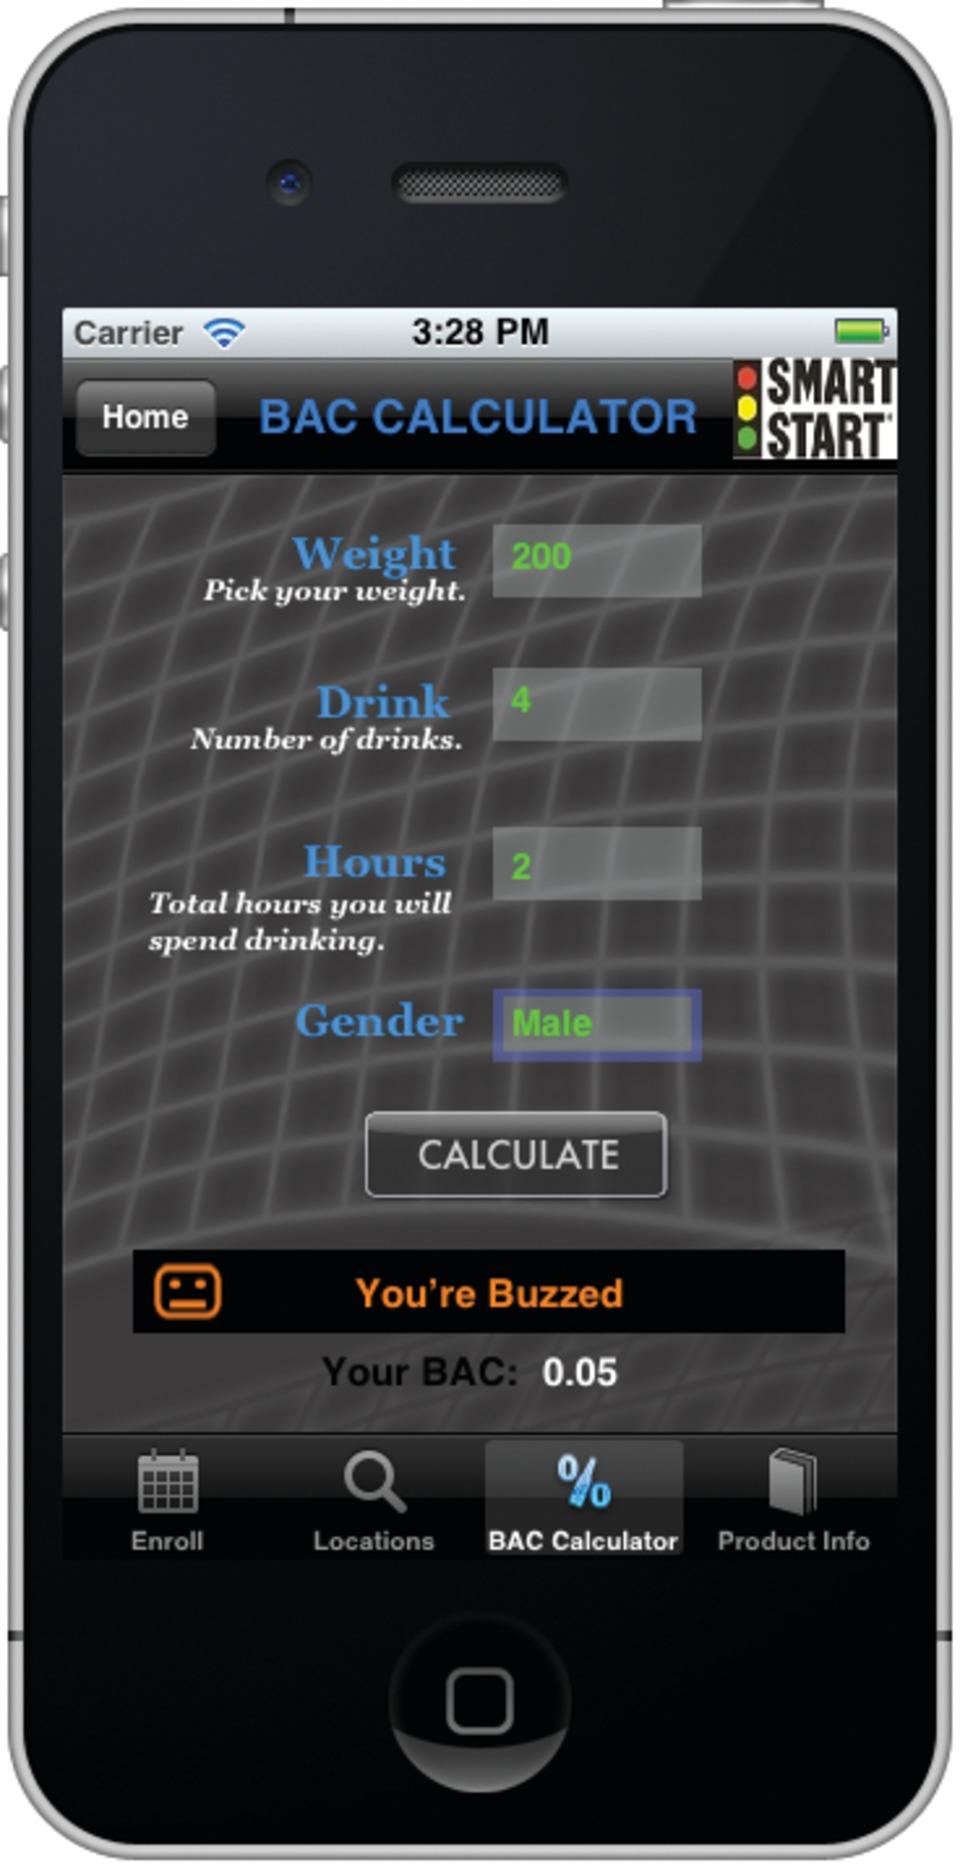 SMART START DWI Smartphone App (Apple & Android) in Handheld